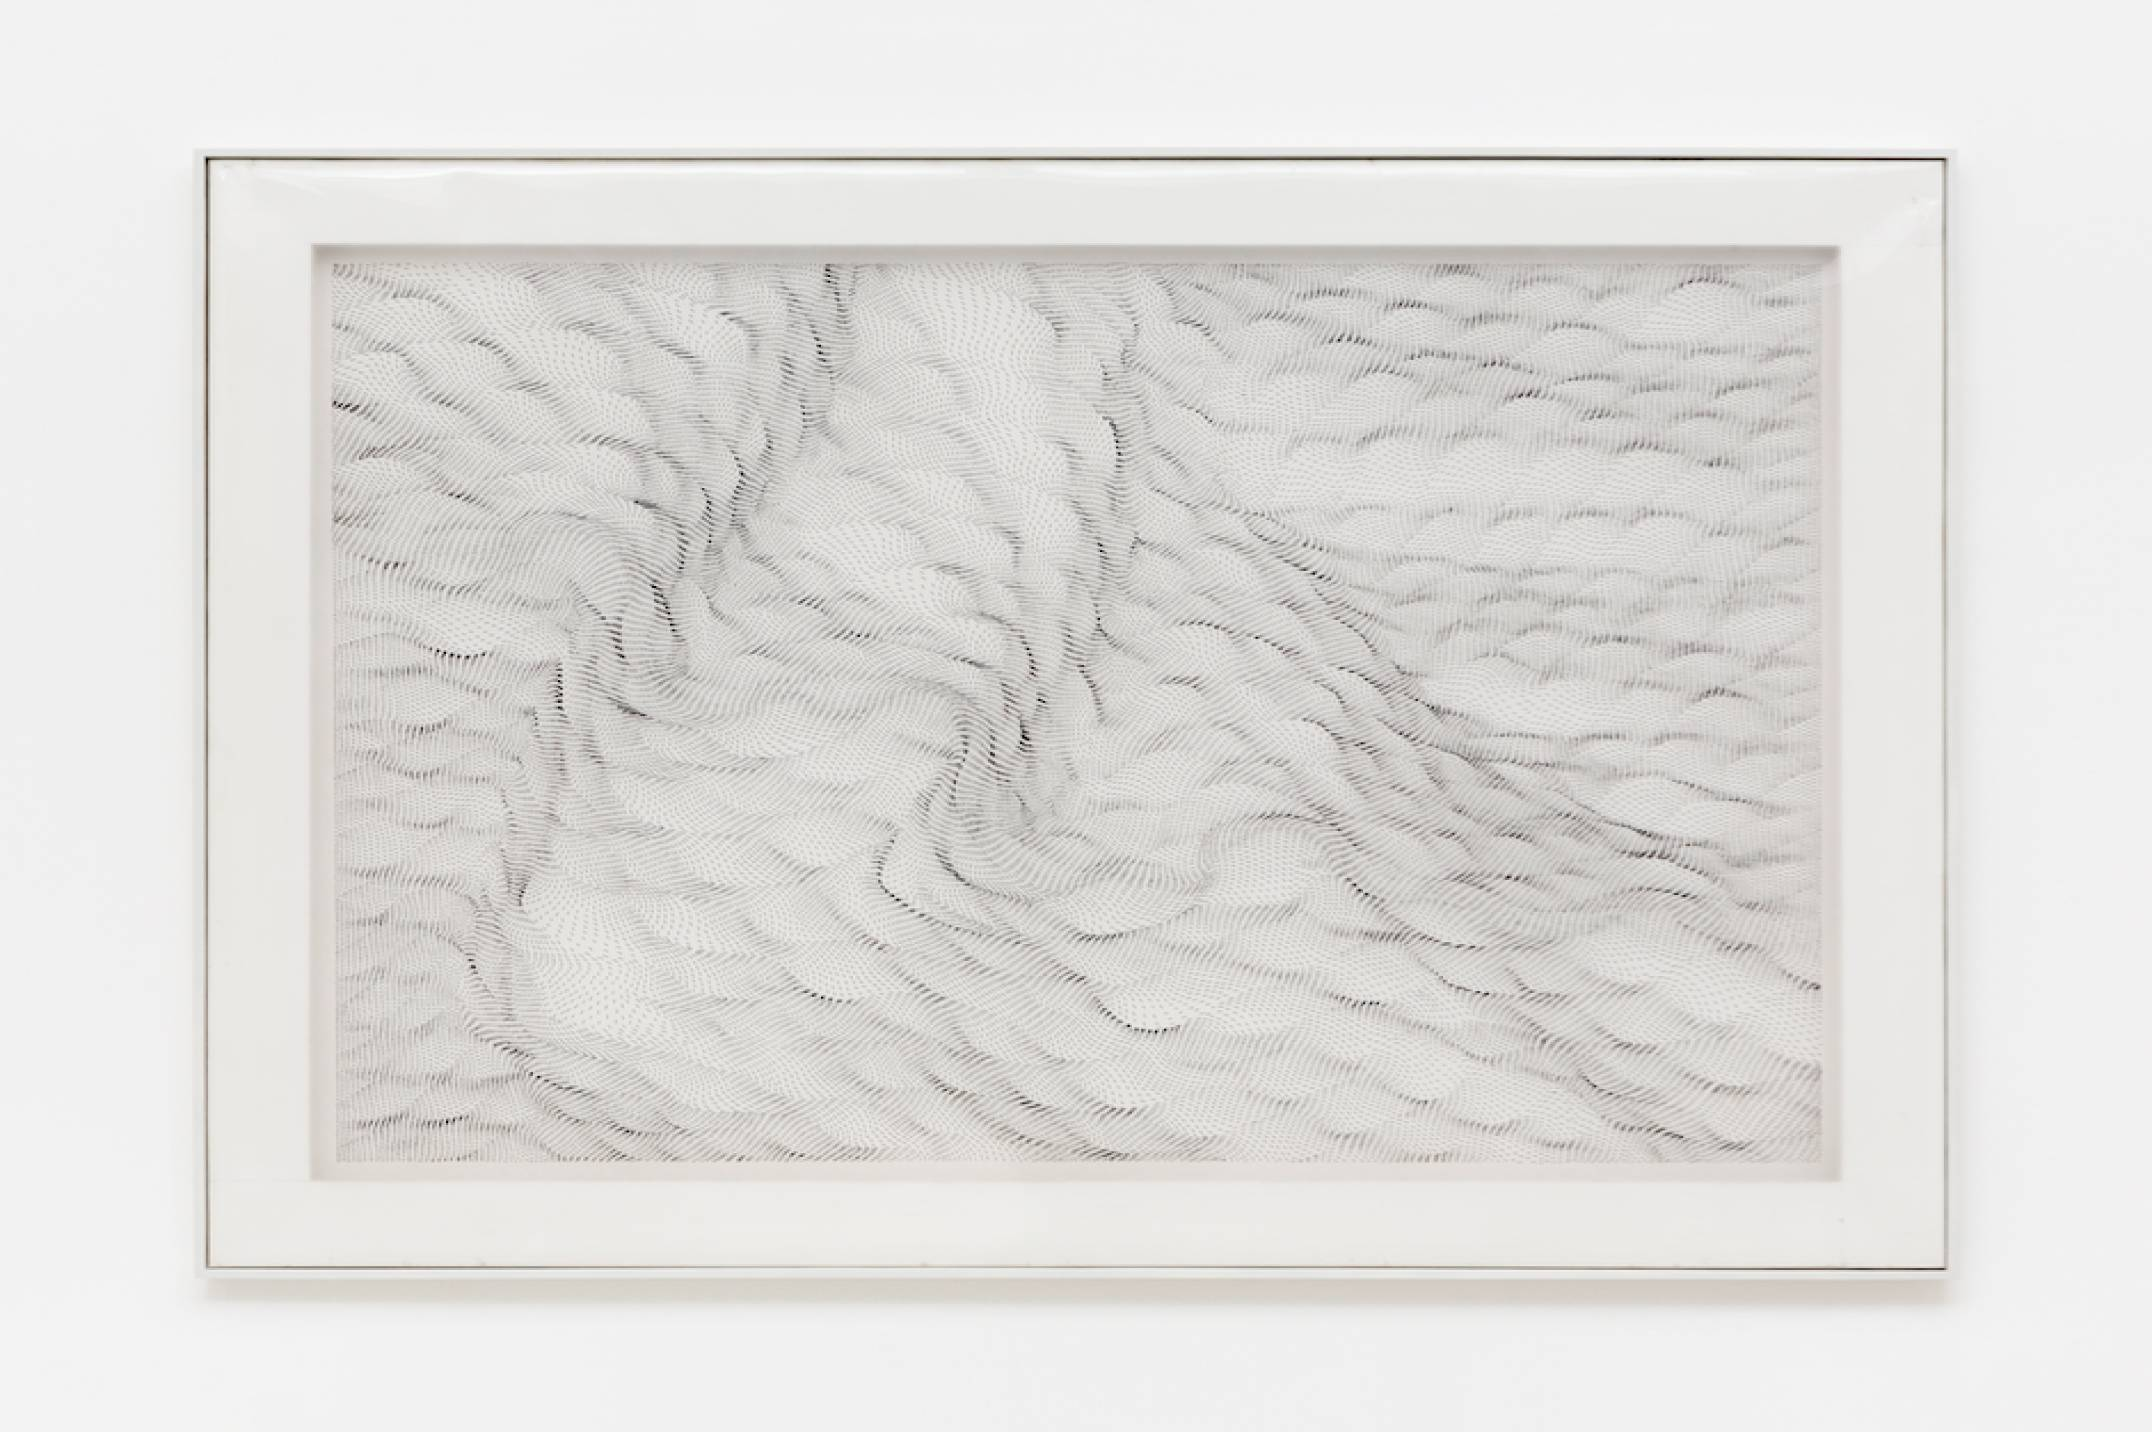 Dadamaino,<em>Il movimento delle cose,</em>1990,ink on polyester,116 × 150 cm - Mendes Wood DM